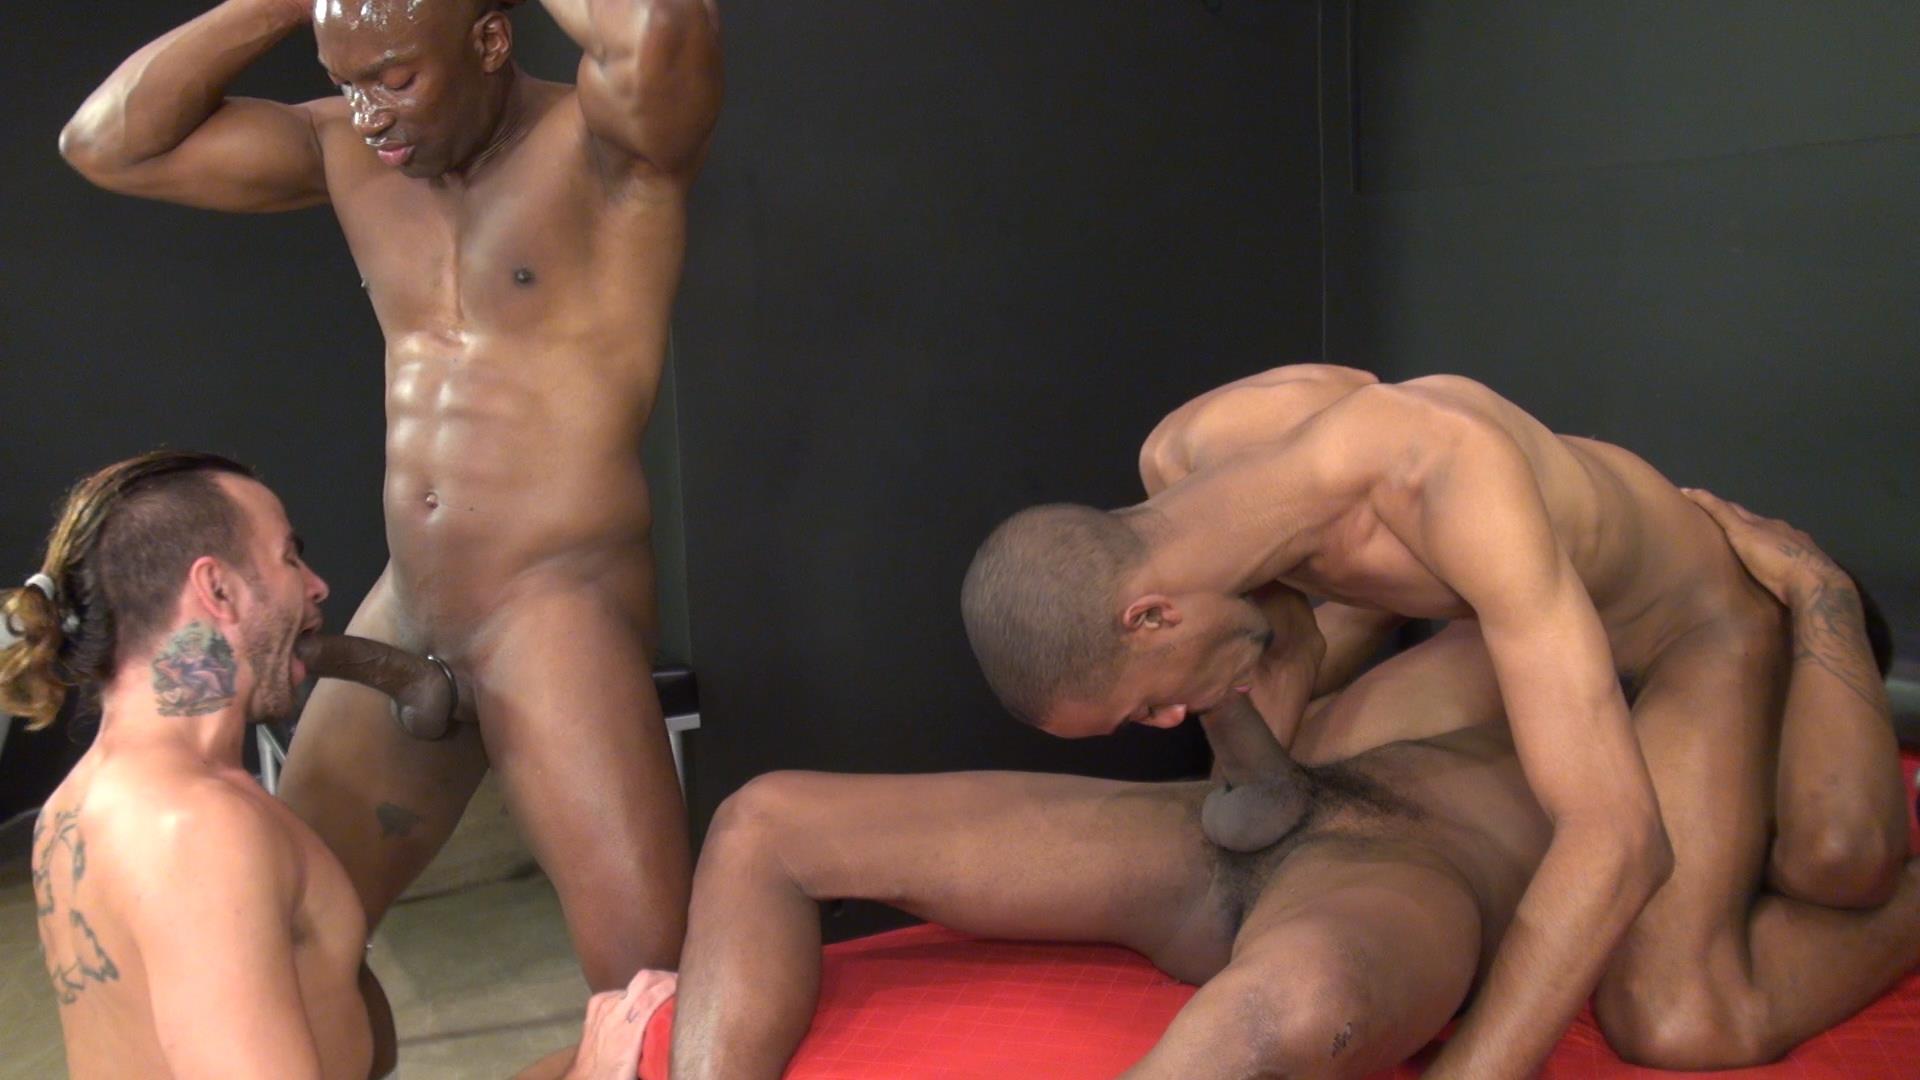 Raw-and-Rough-Champ-Robinson-Lukas-Cipriani-Knockout-Tigger-Redd-BBBH-Amateur-Gay-Porn-16 White Boy Gets A Breeding By Three Big Black Dicks